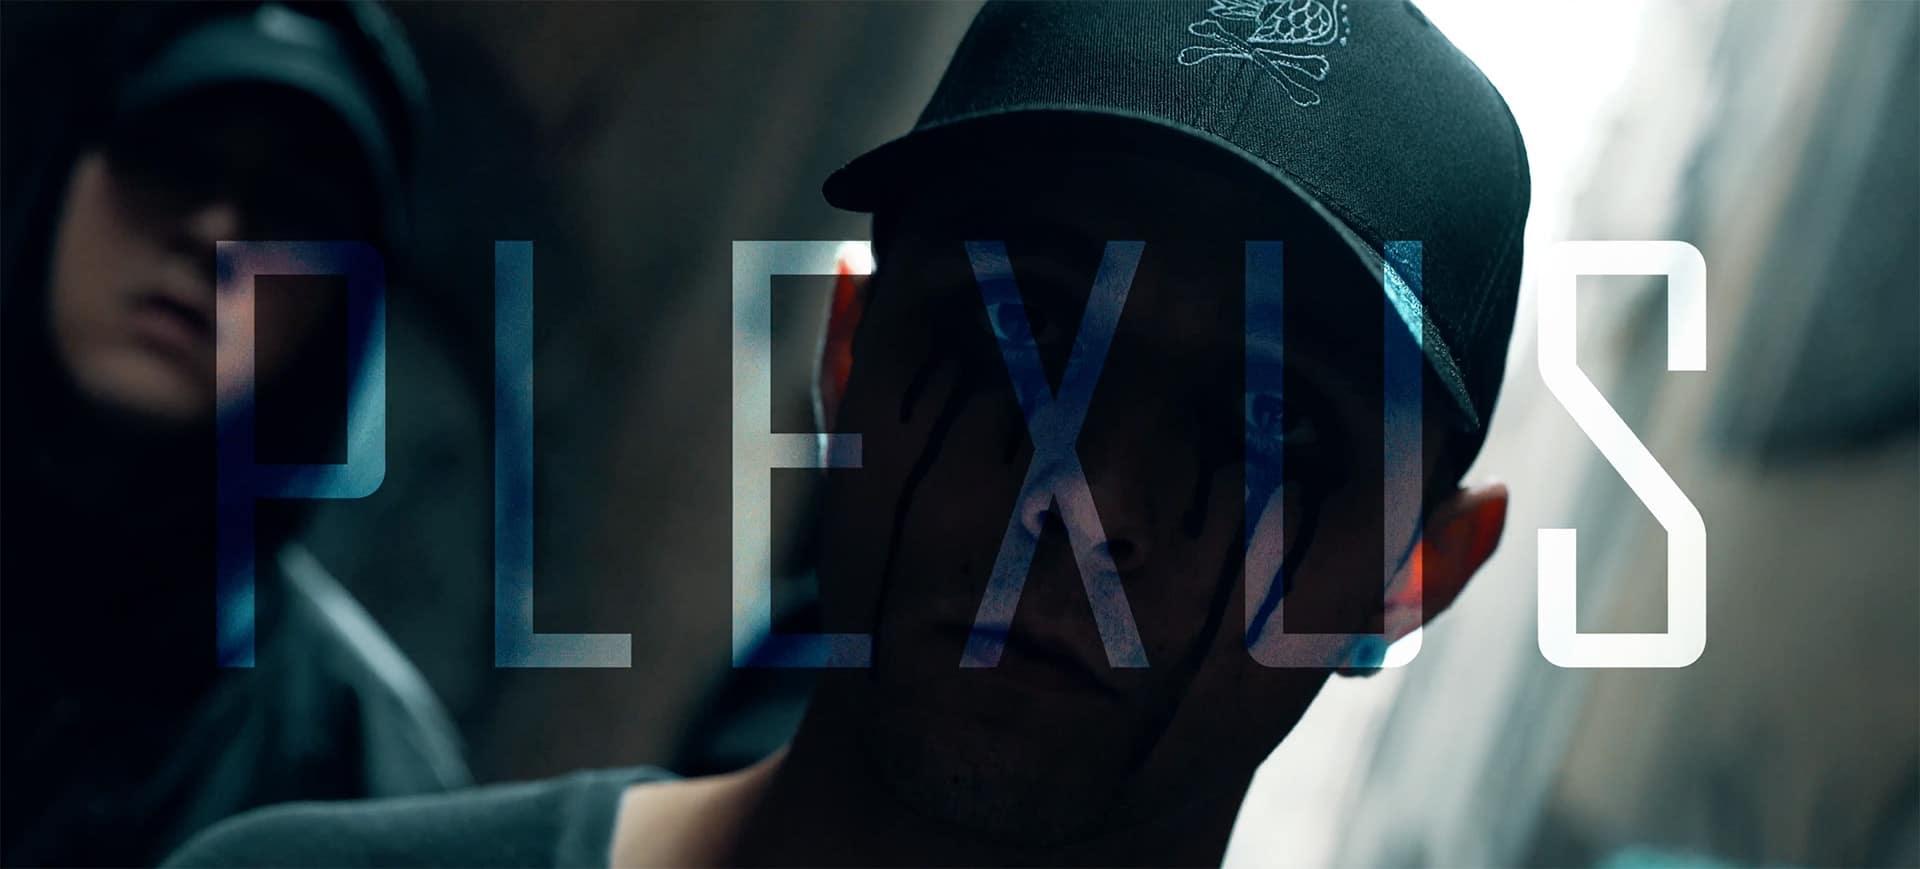 CLEPS - Plexus